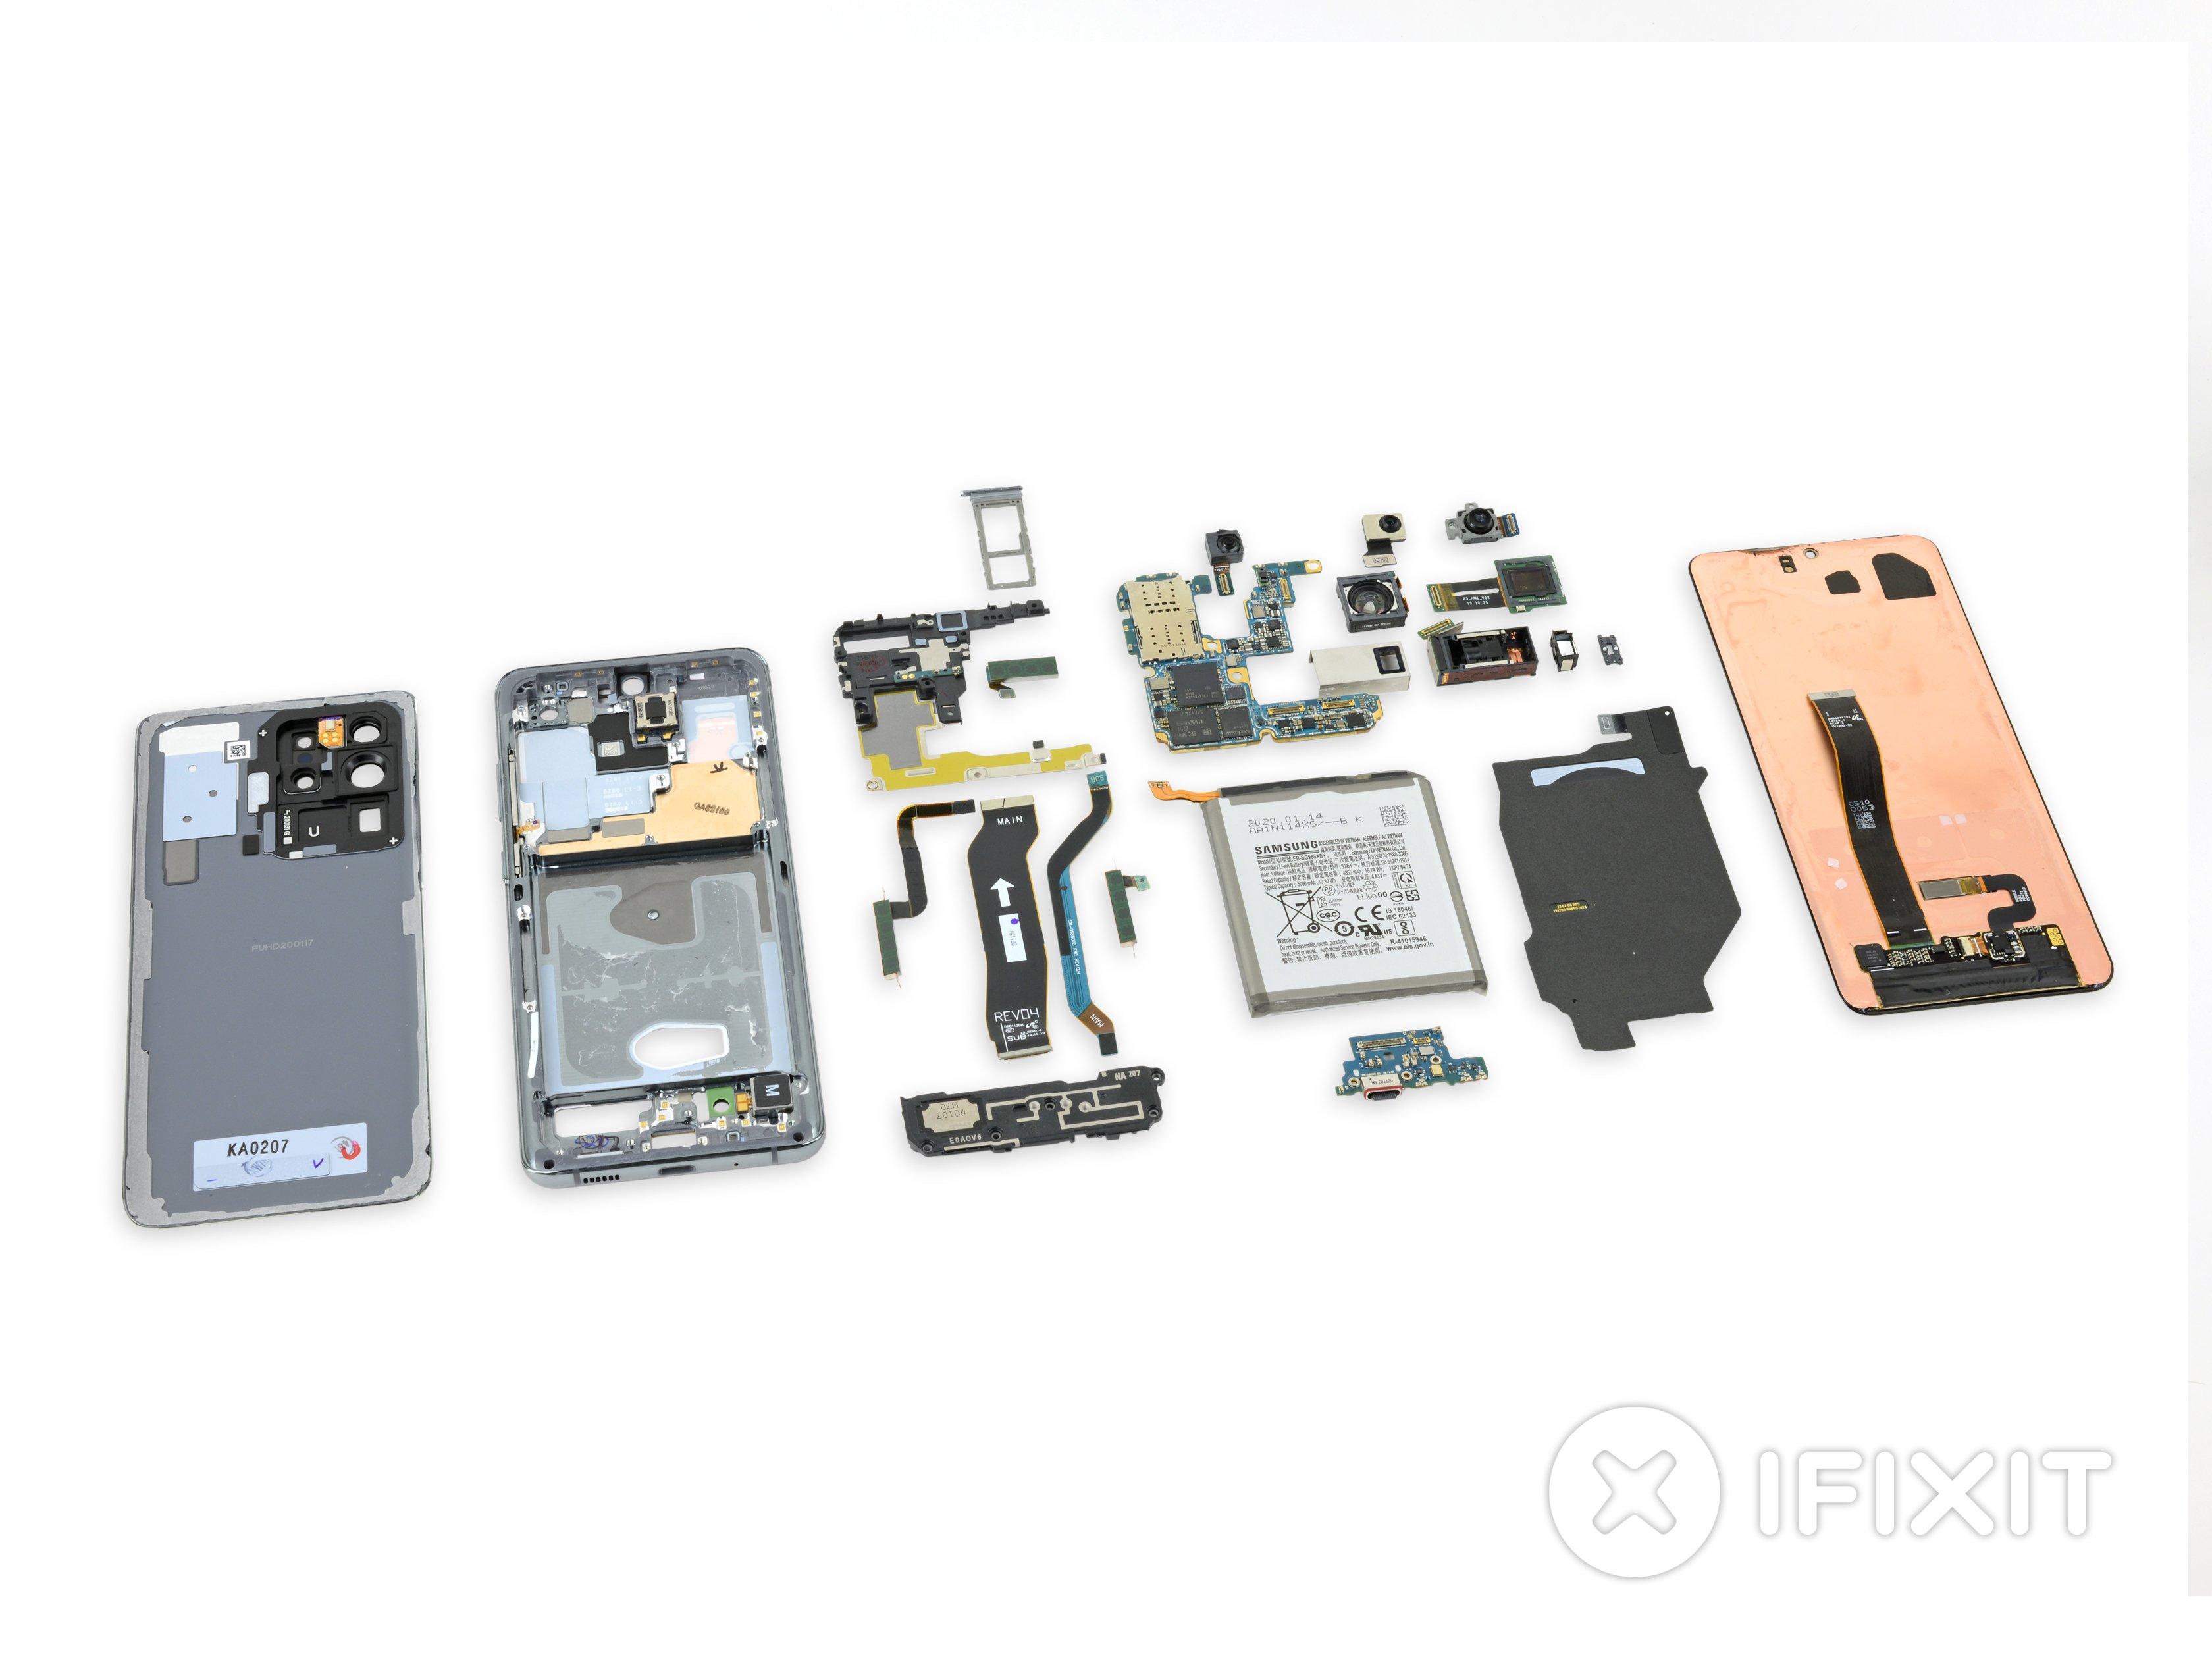 Samsung Galaxy S20 Ultra Teardown Ifixit